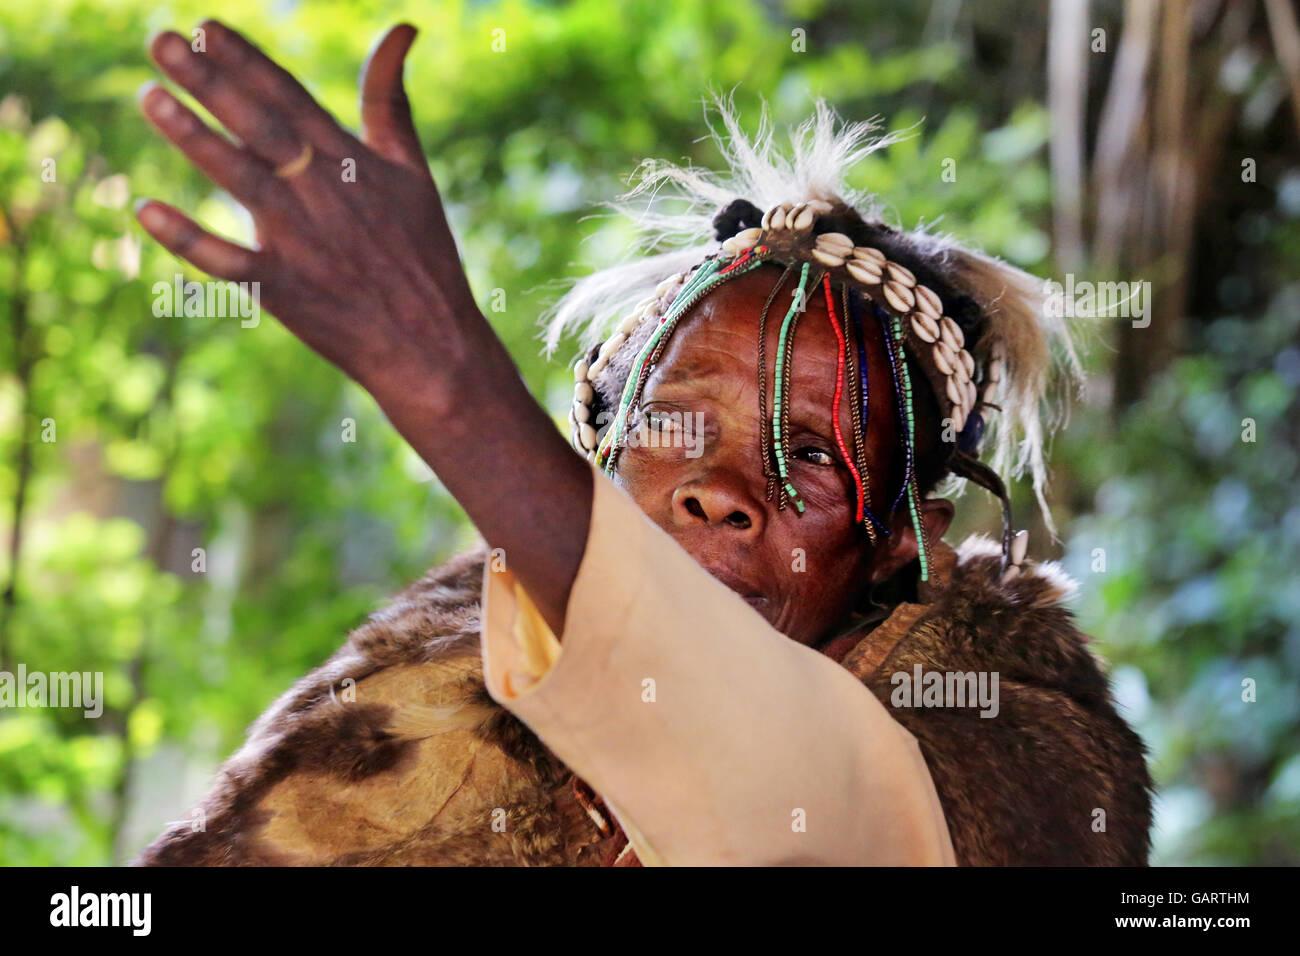 Professional circumciser still practicing female genital mutilation (FGM) in her traditional circumcision costume. - Stock Image